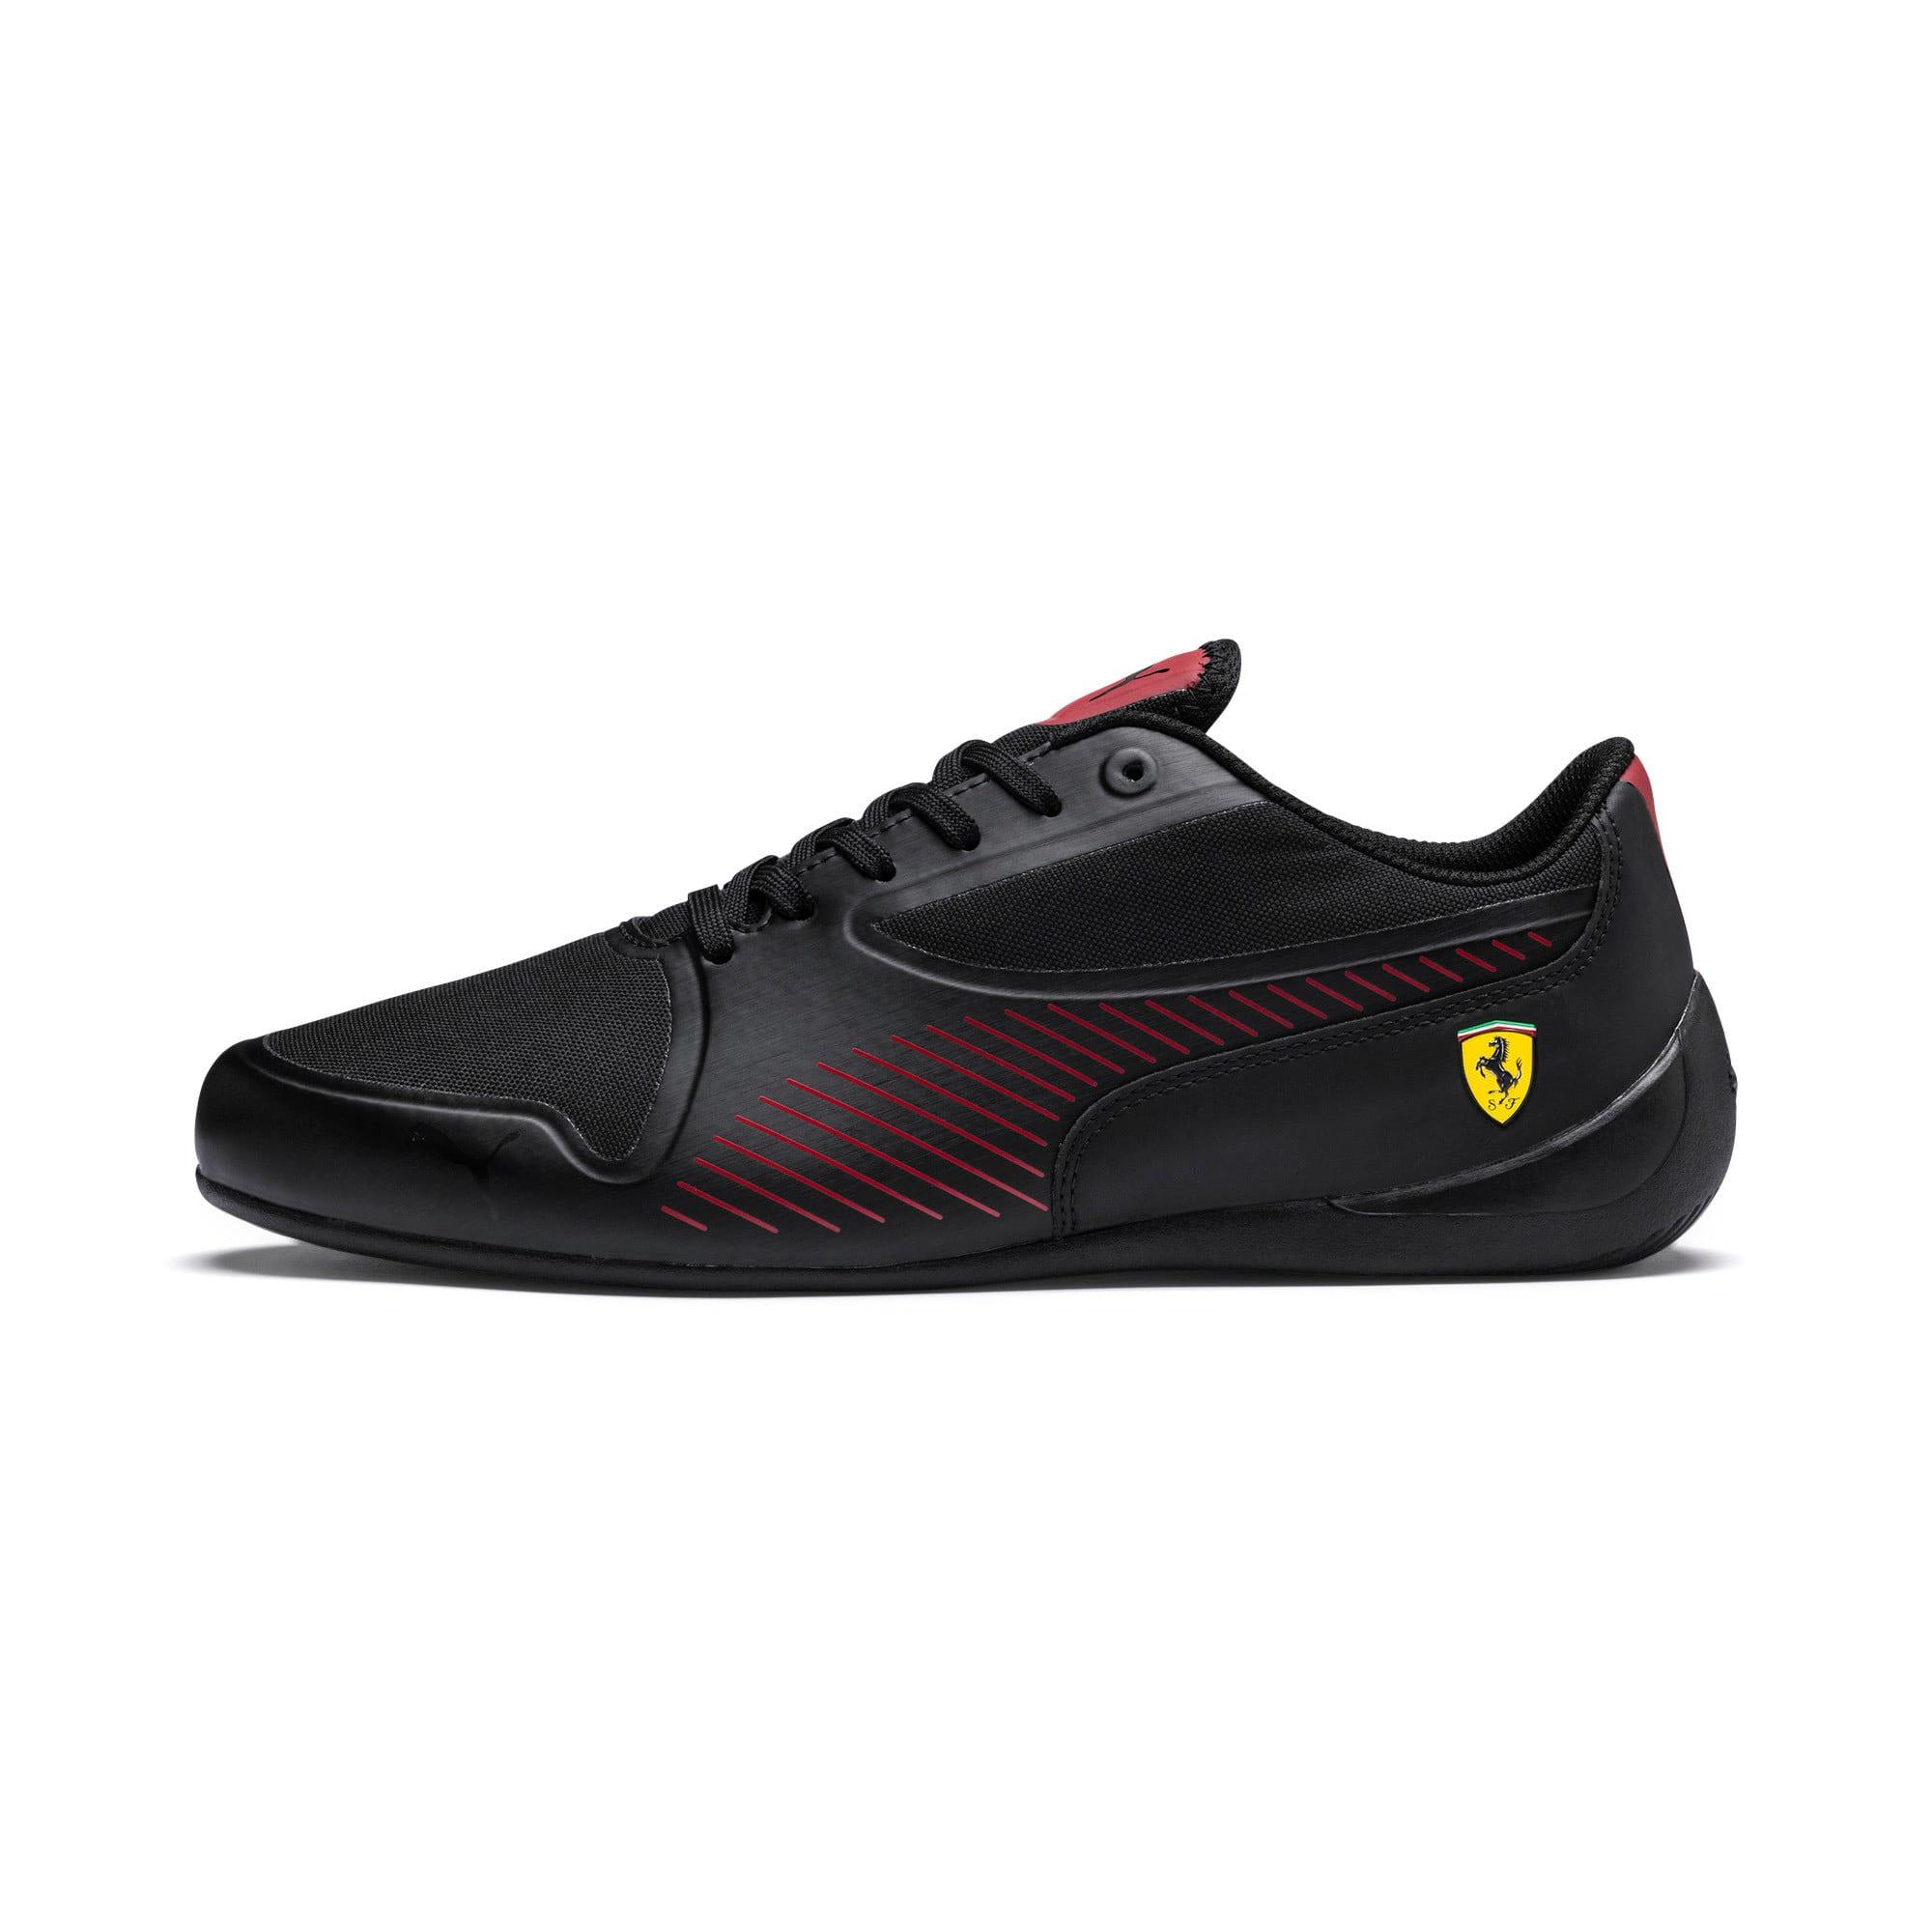 Thumbnail 1 of Scuderia Ferrari Drift Cat 7 Ultra Shoes, Puma Black-Rosso Corsa, medium